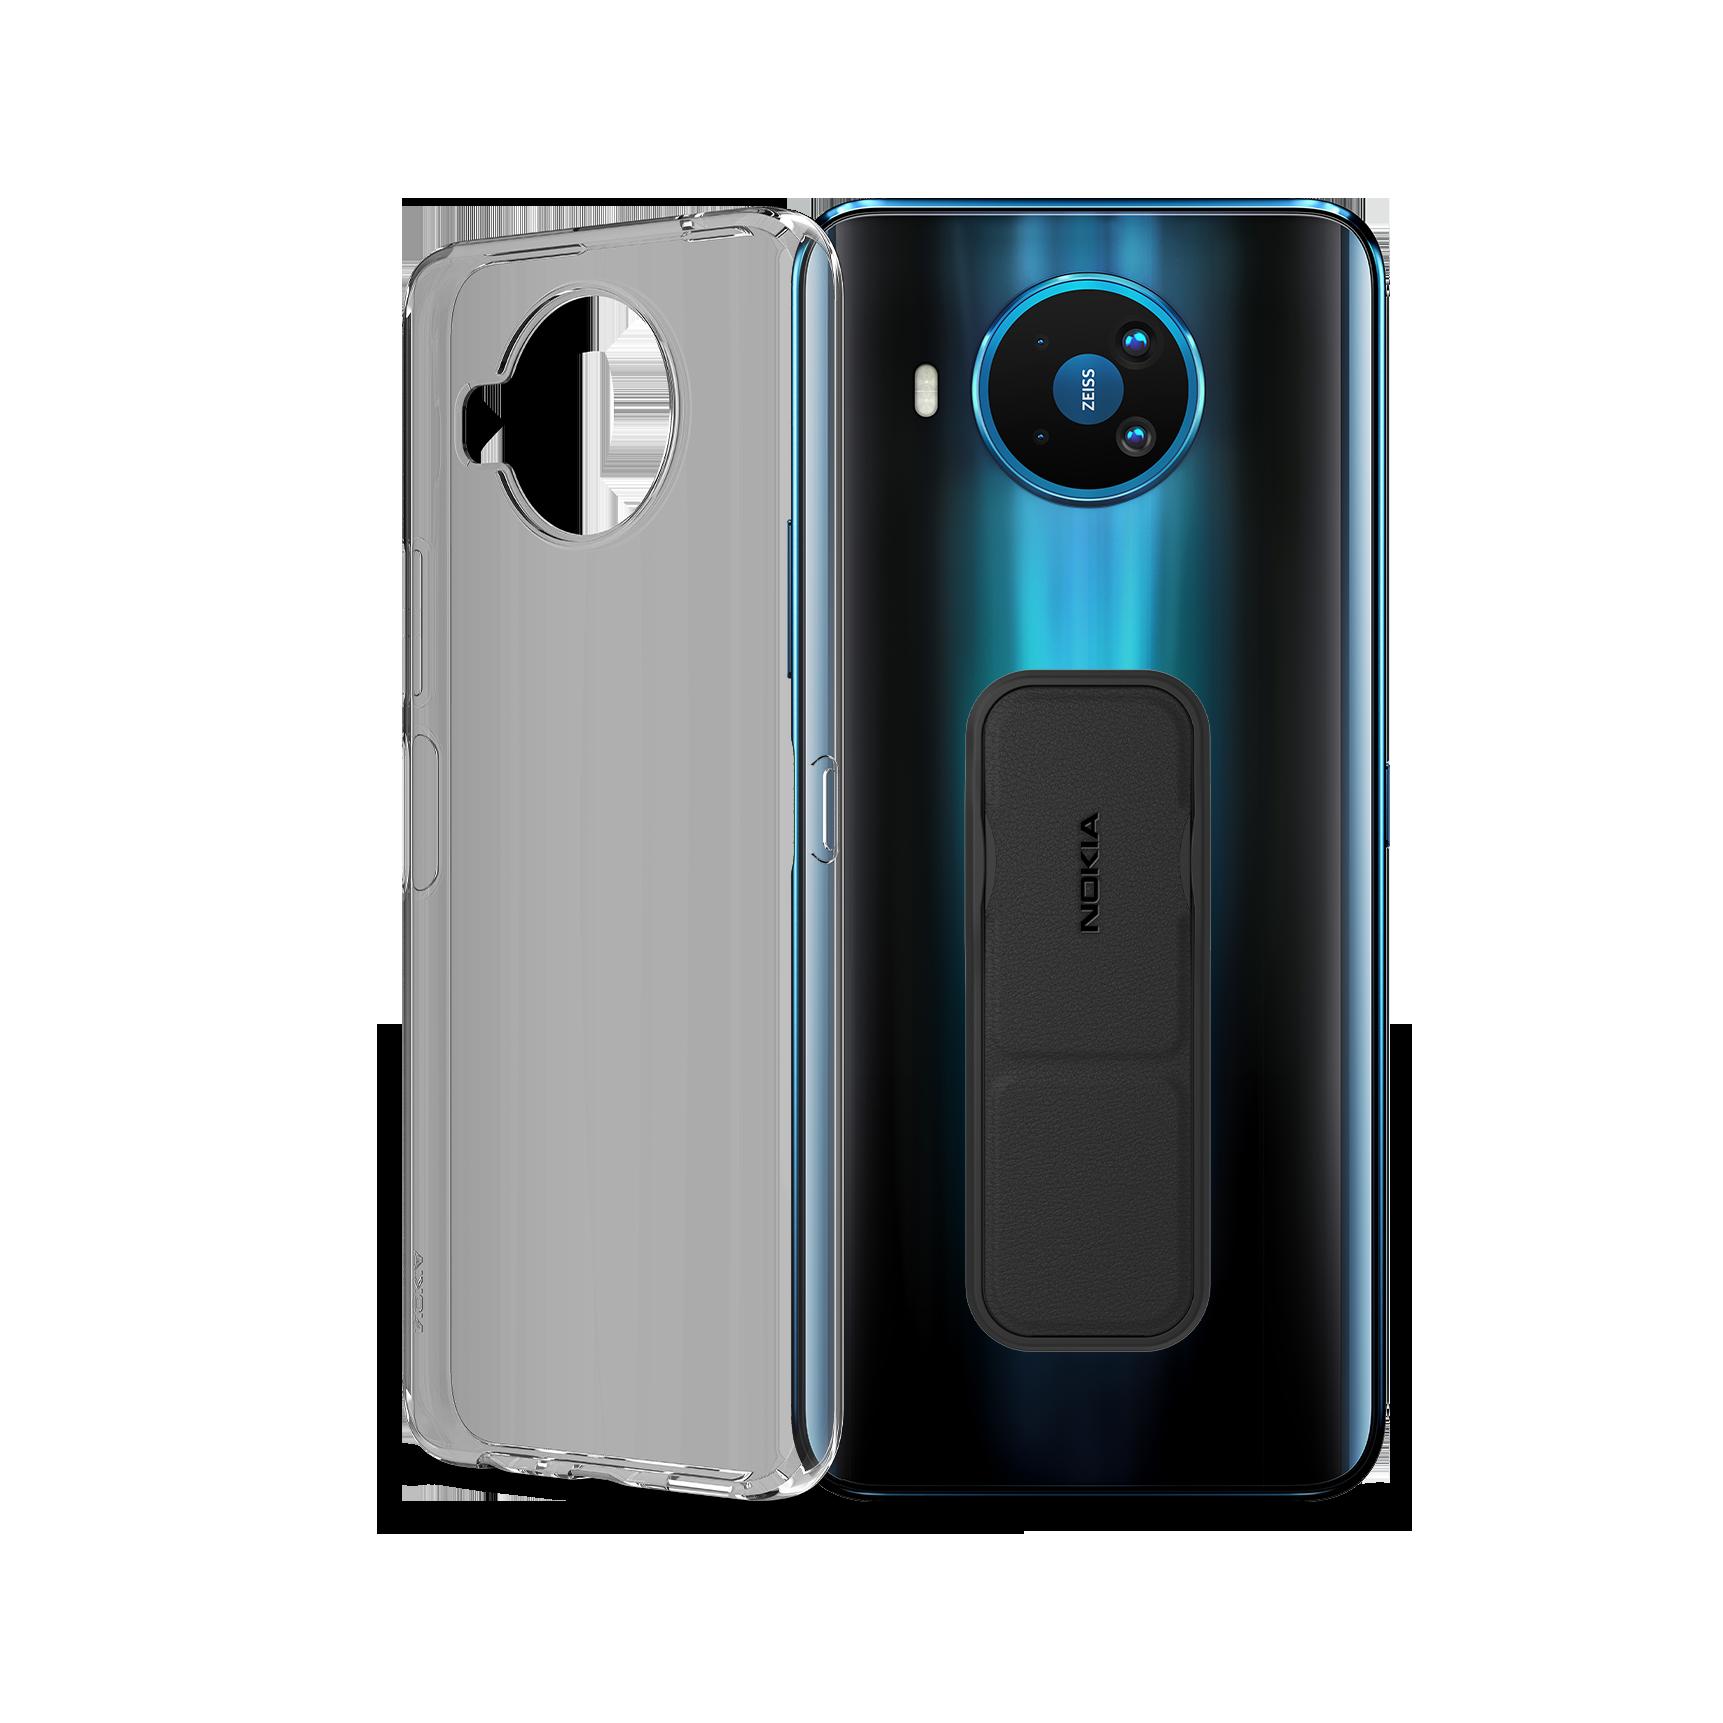 Nokia 8.3 5G + Nokia Clear Case + Nokia Grip and Stand